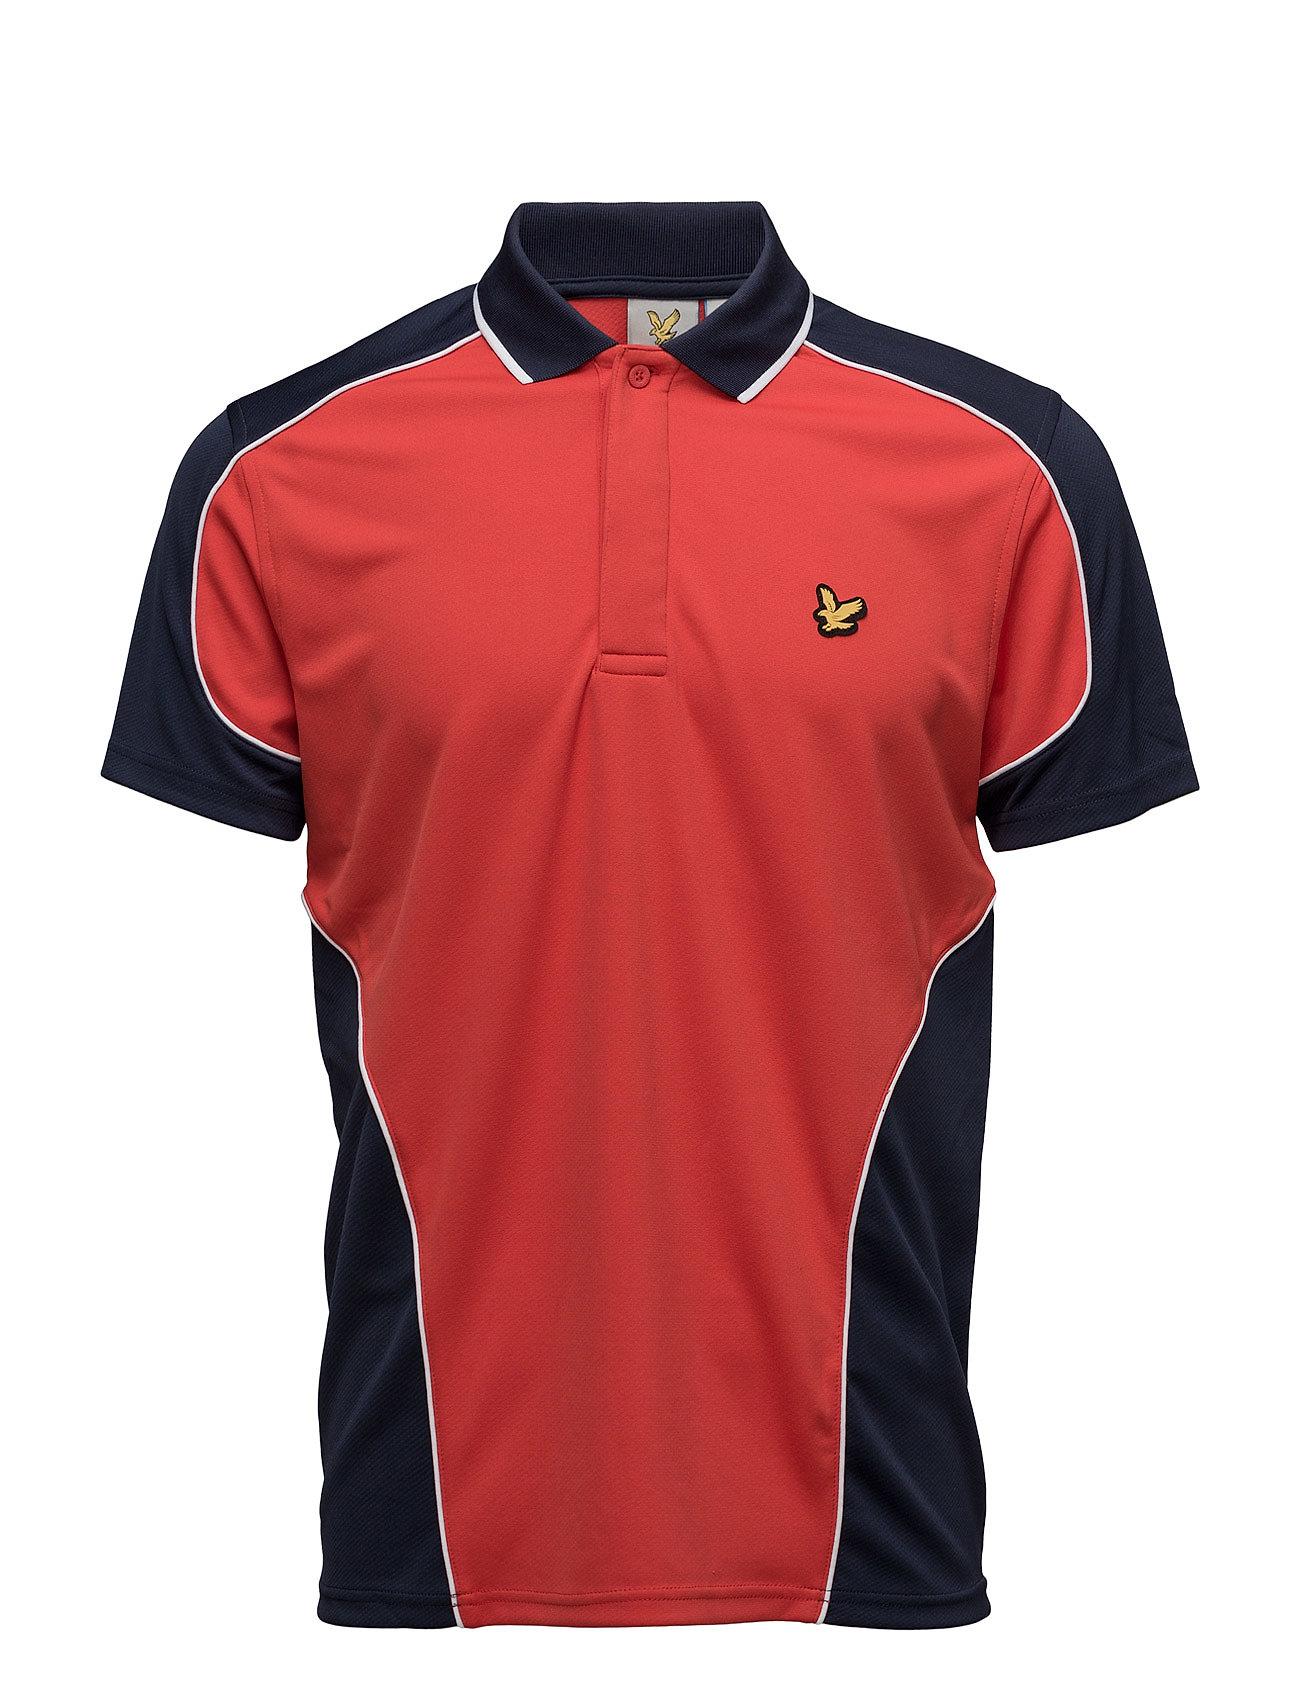 Hendry 2-Tone Mesh Polo Lyle & Scott Sport Kortærmede polo t-shirts til Herrer i